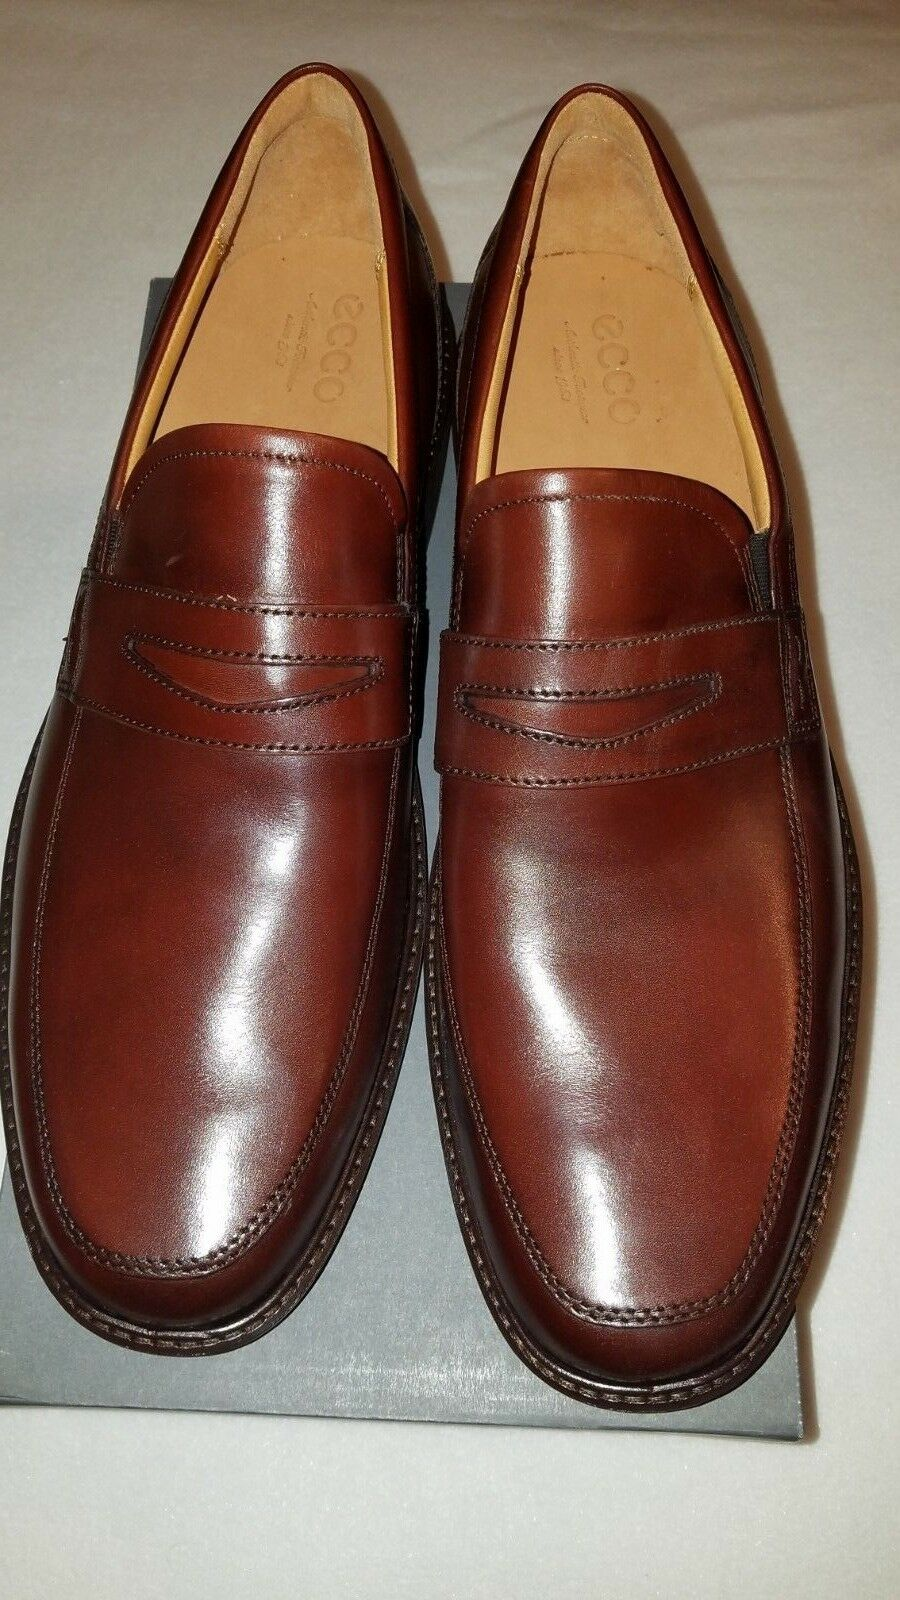 abeeded37d6 ECCO Men s Holton Penny Loafer Shoe 48 Eu 14-14.5 US Dressy Business ...